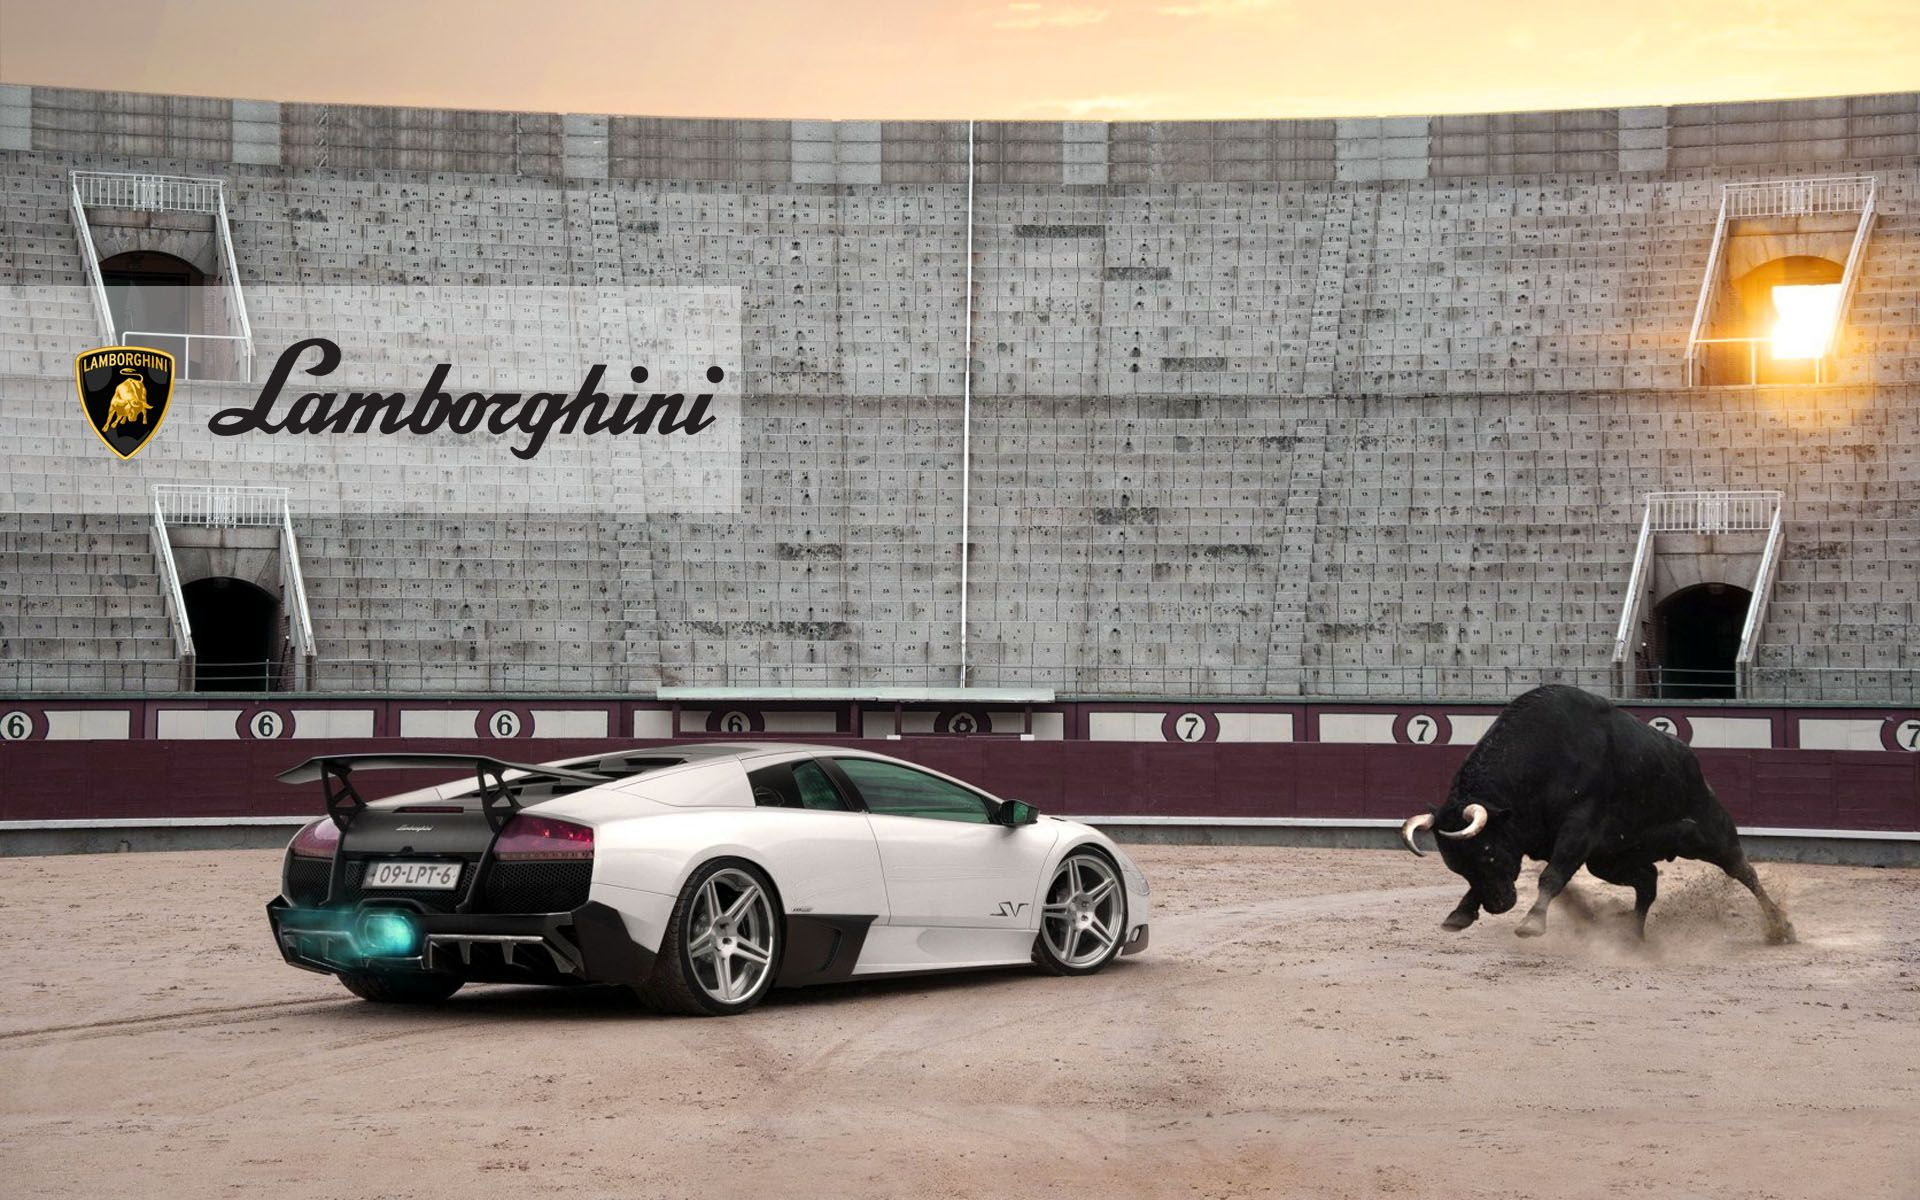 Lamborghini Murcielago Lp670 Sv Wallpaper Car Hd Wallpaper